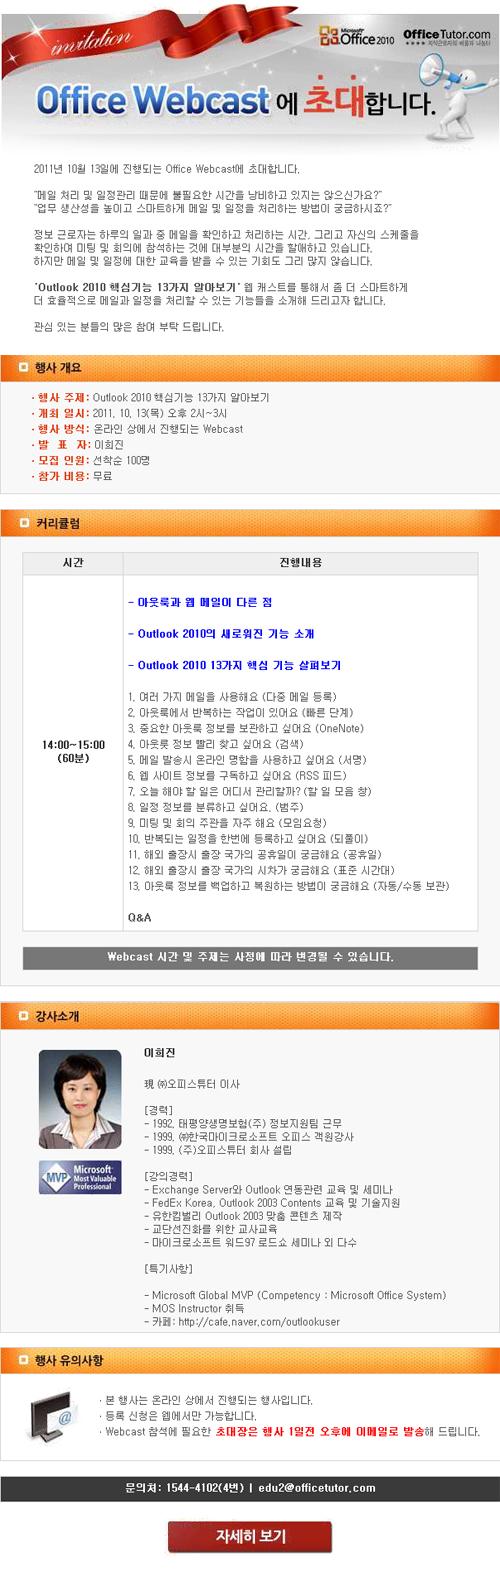 Office Webcast 개최 - Outlook 2010 핵심기능 13가지 알아보기 (10/13)